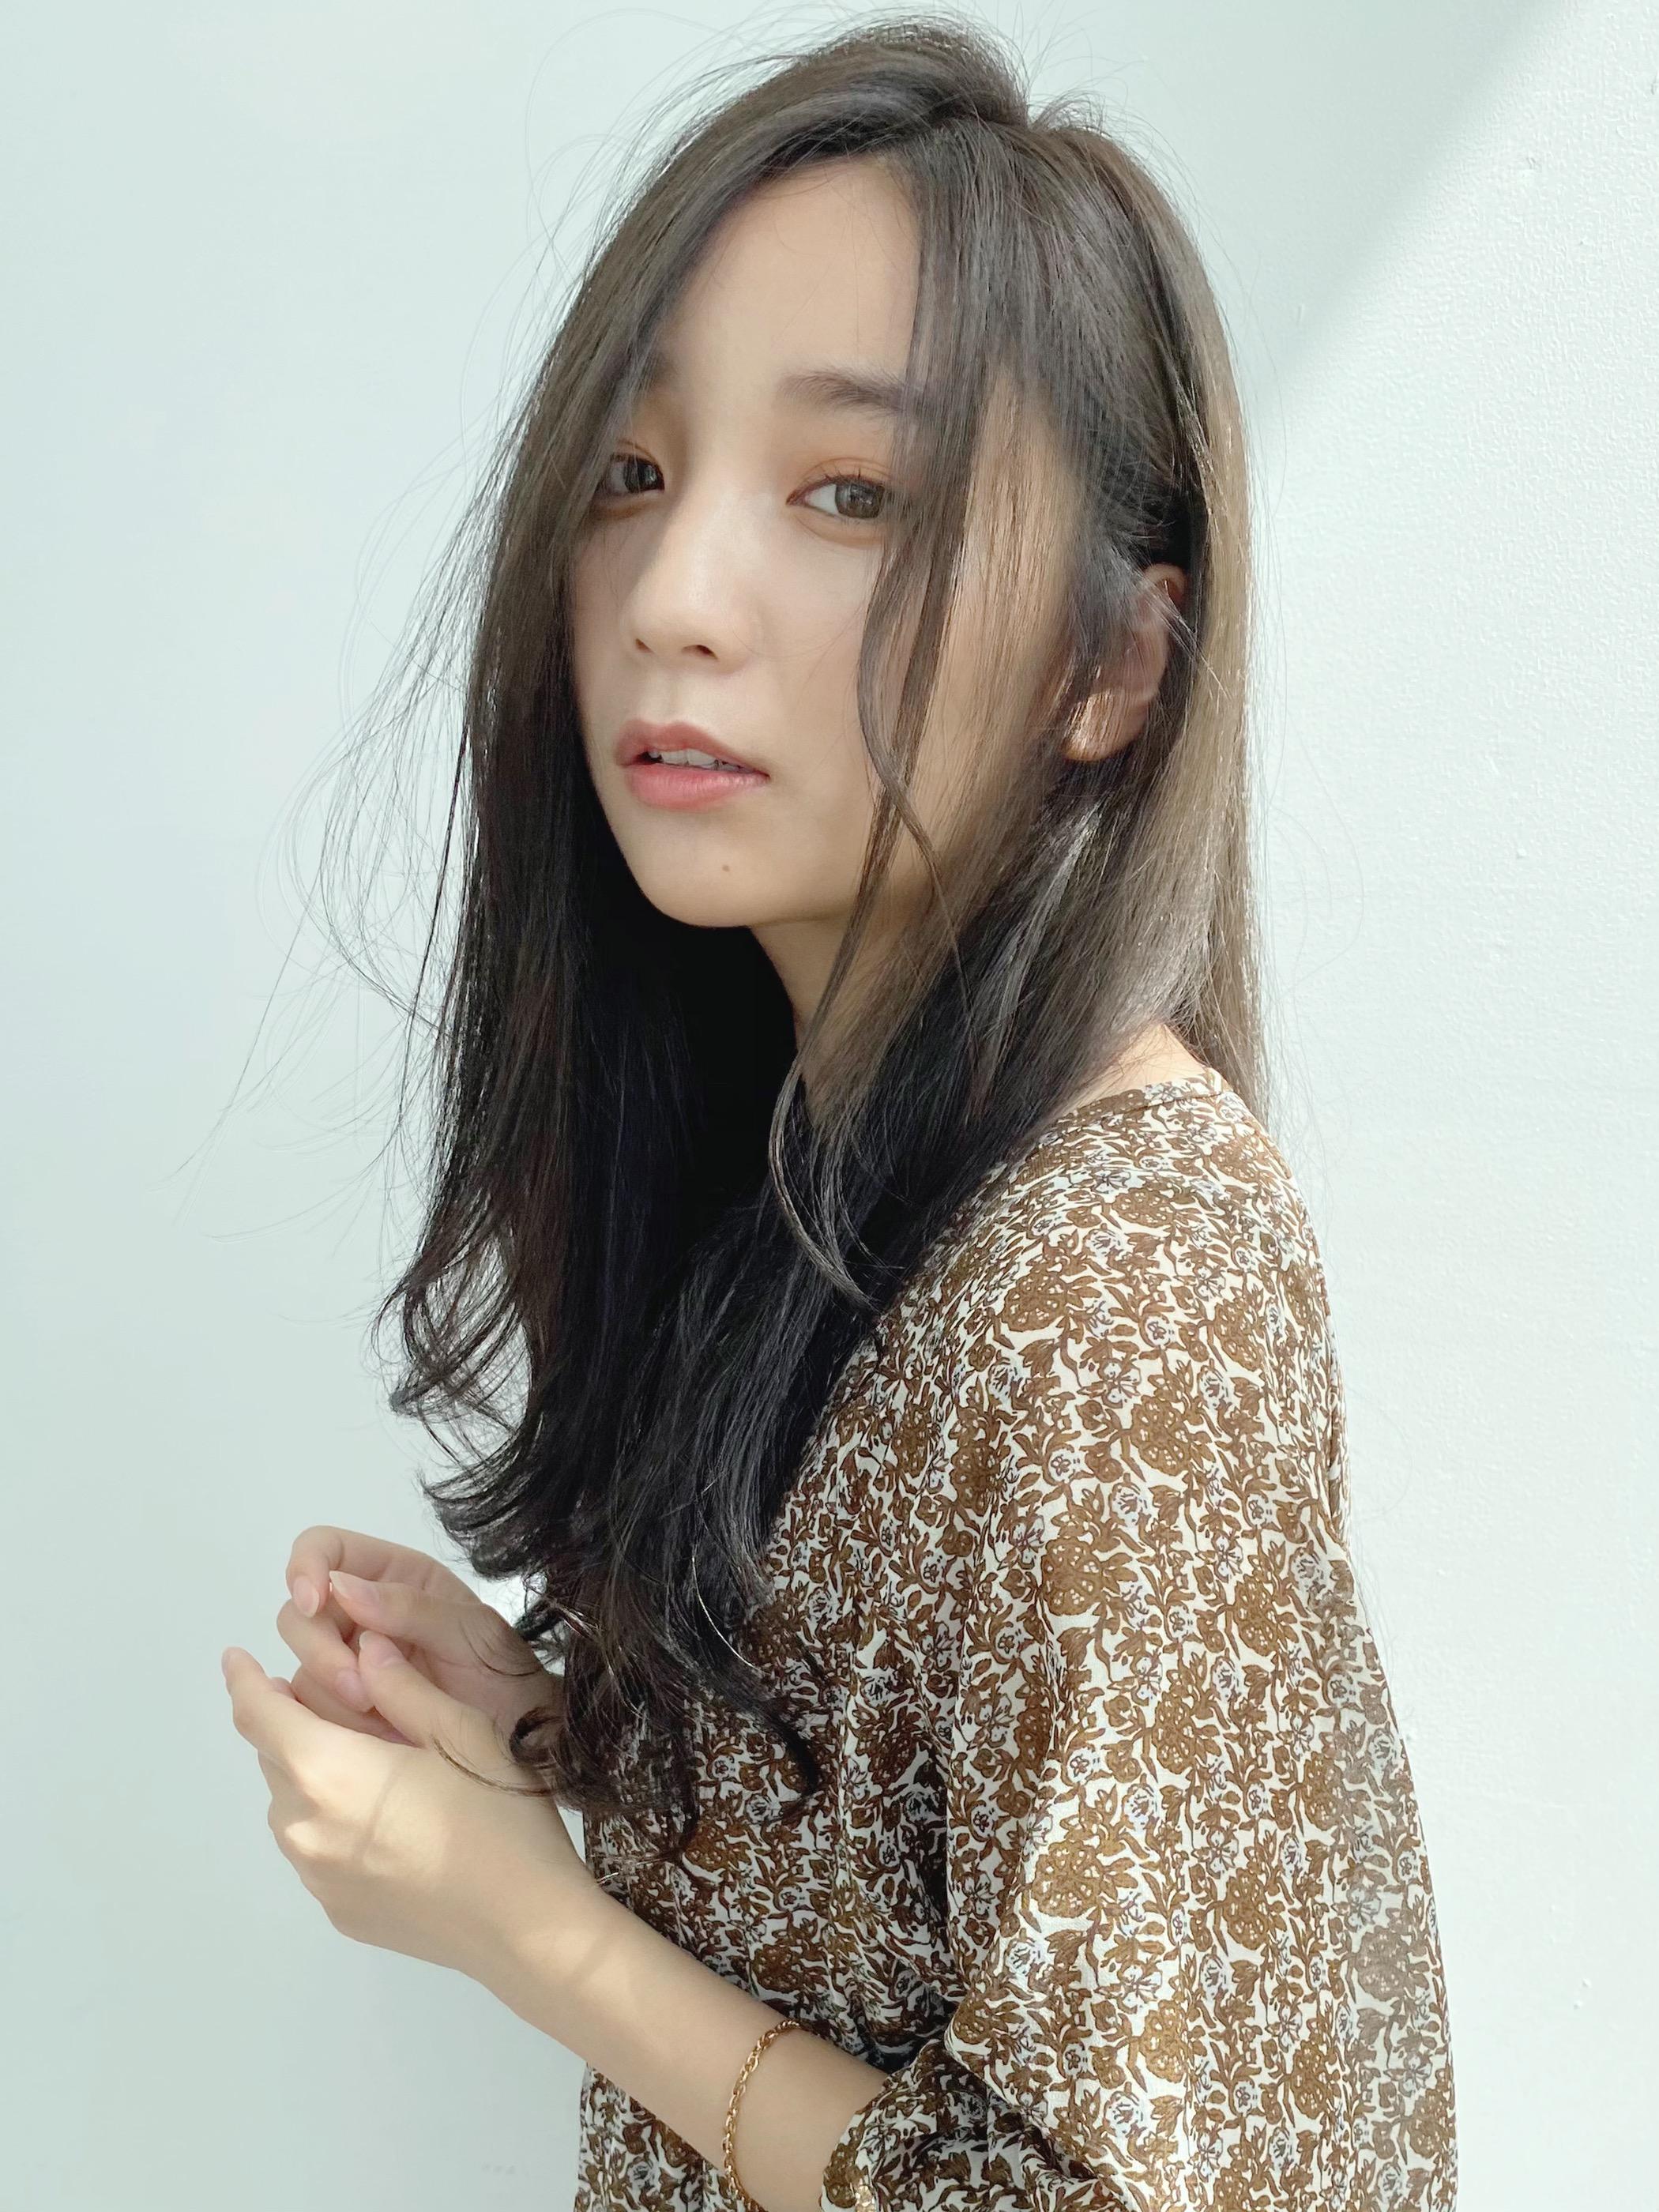 【Euphoria 銀座本店】シースルーレイヤーミディ 山崎翼